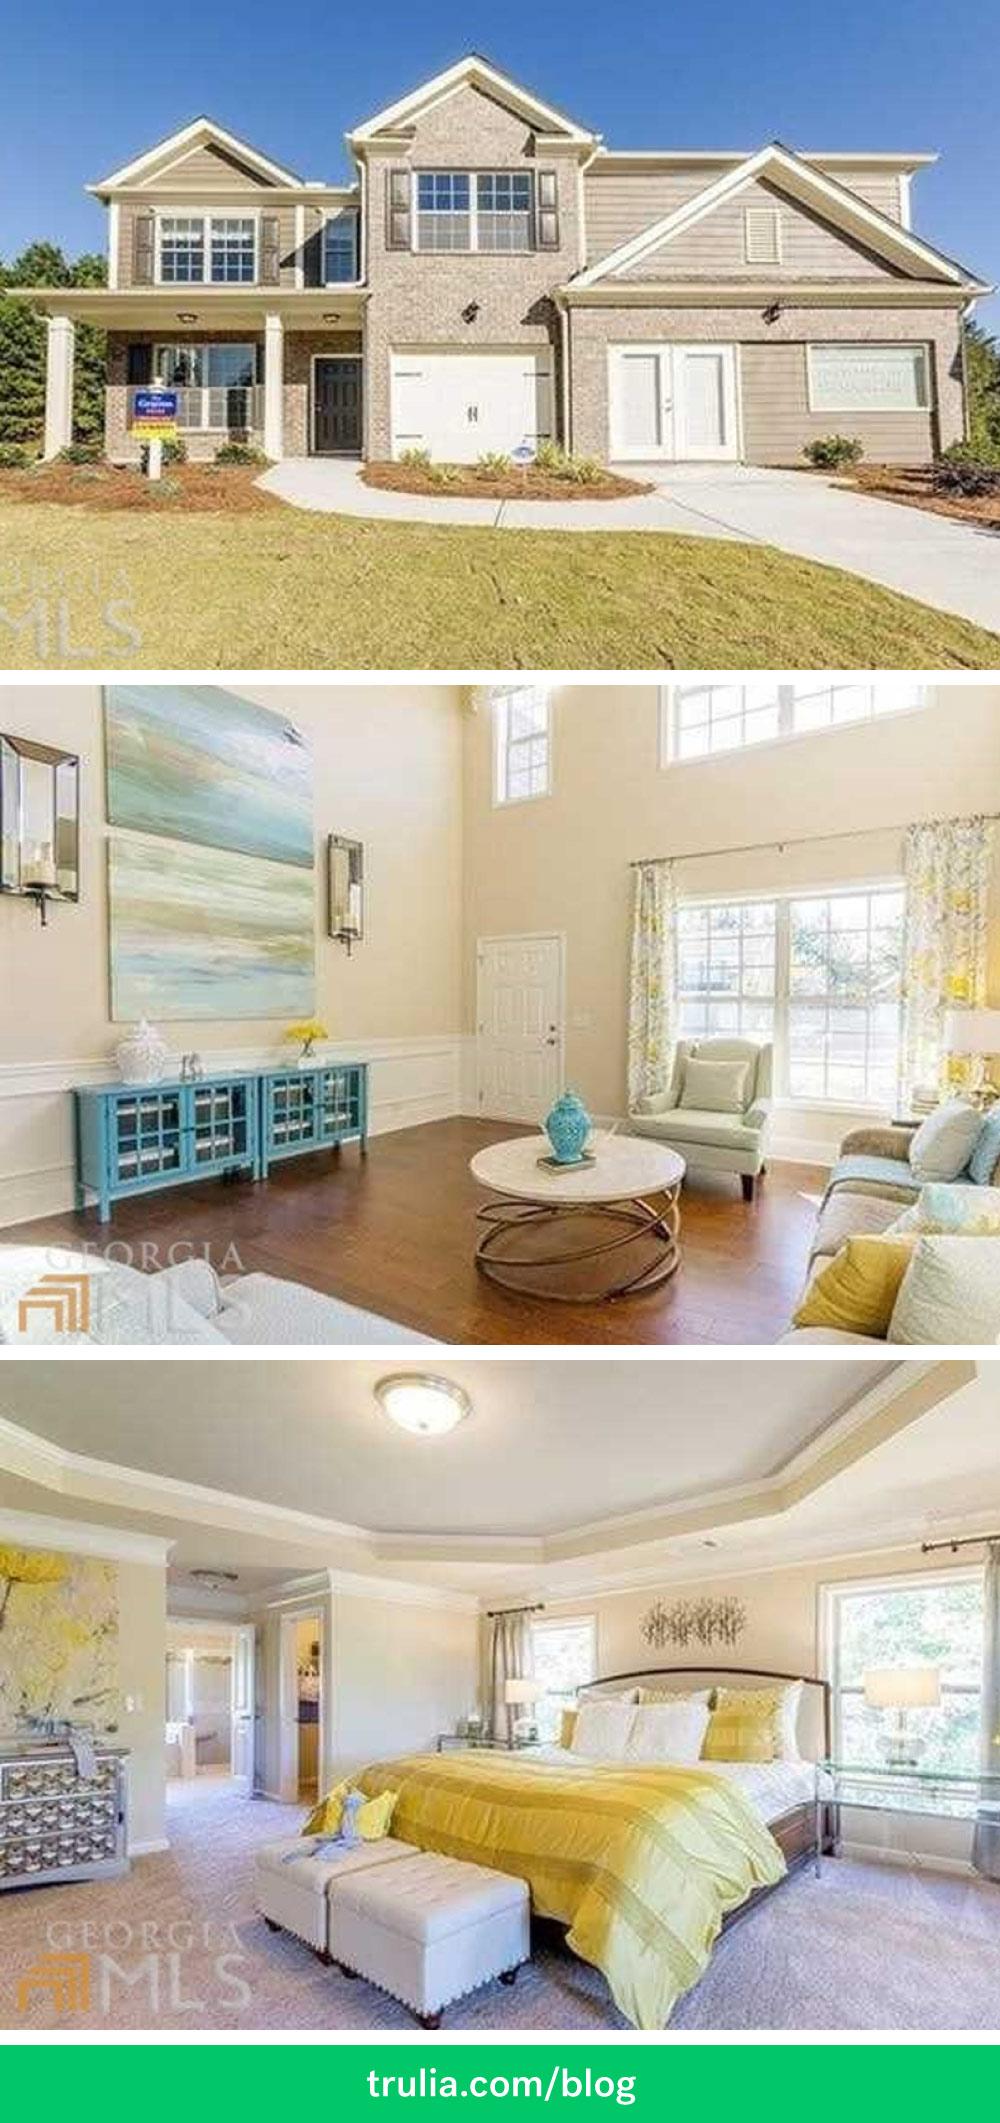 Affordable Atlanta Real Estate